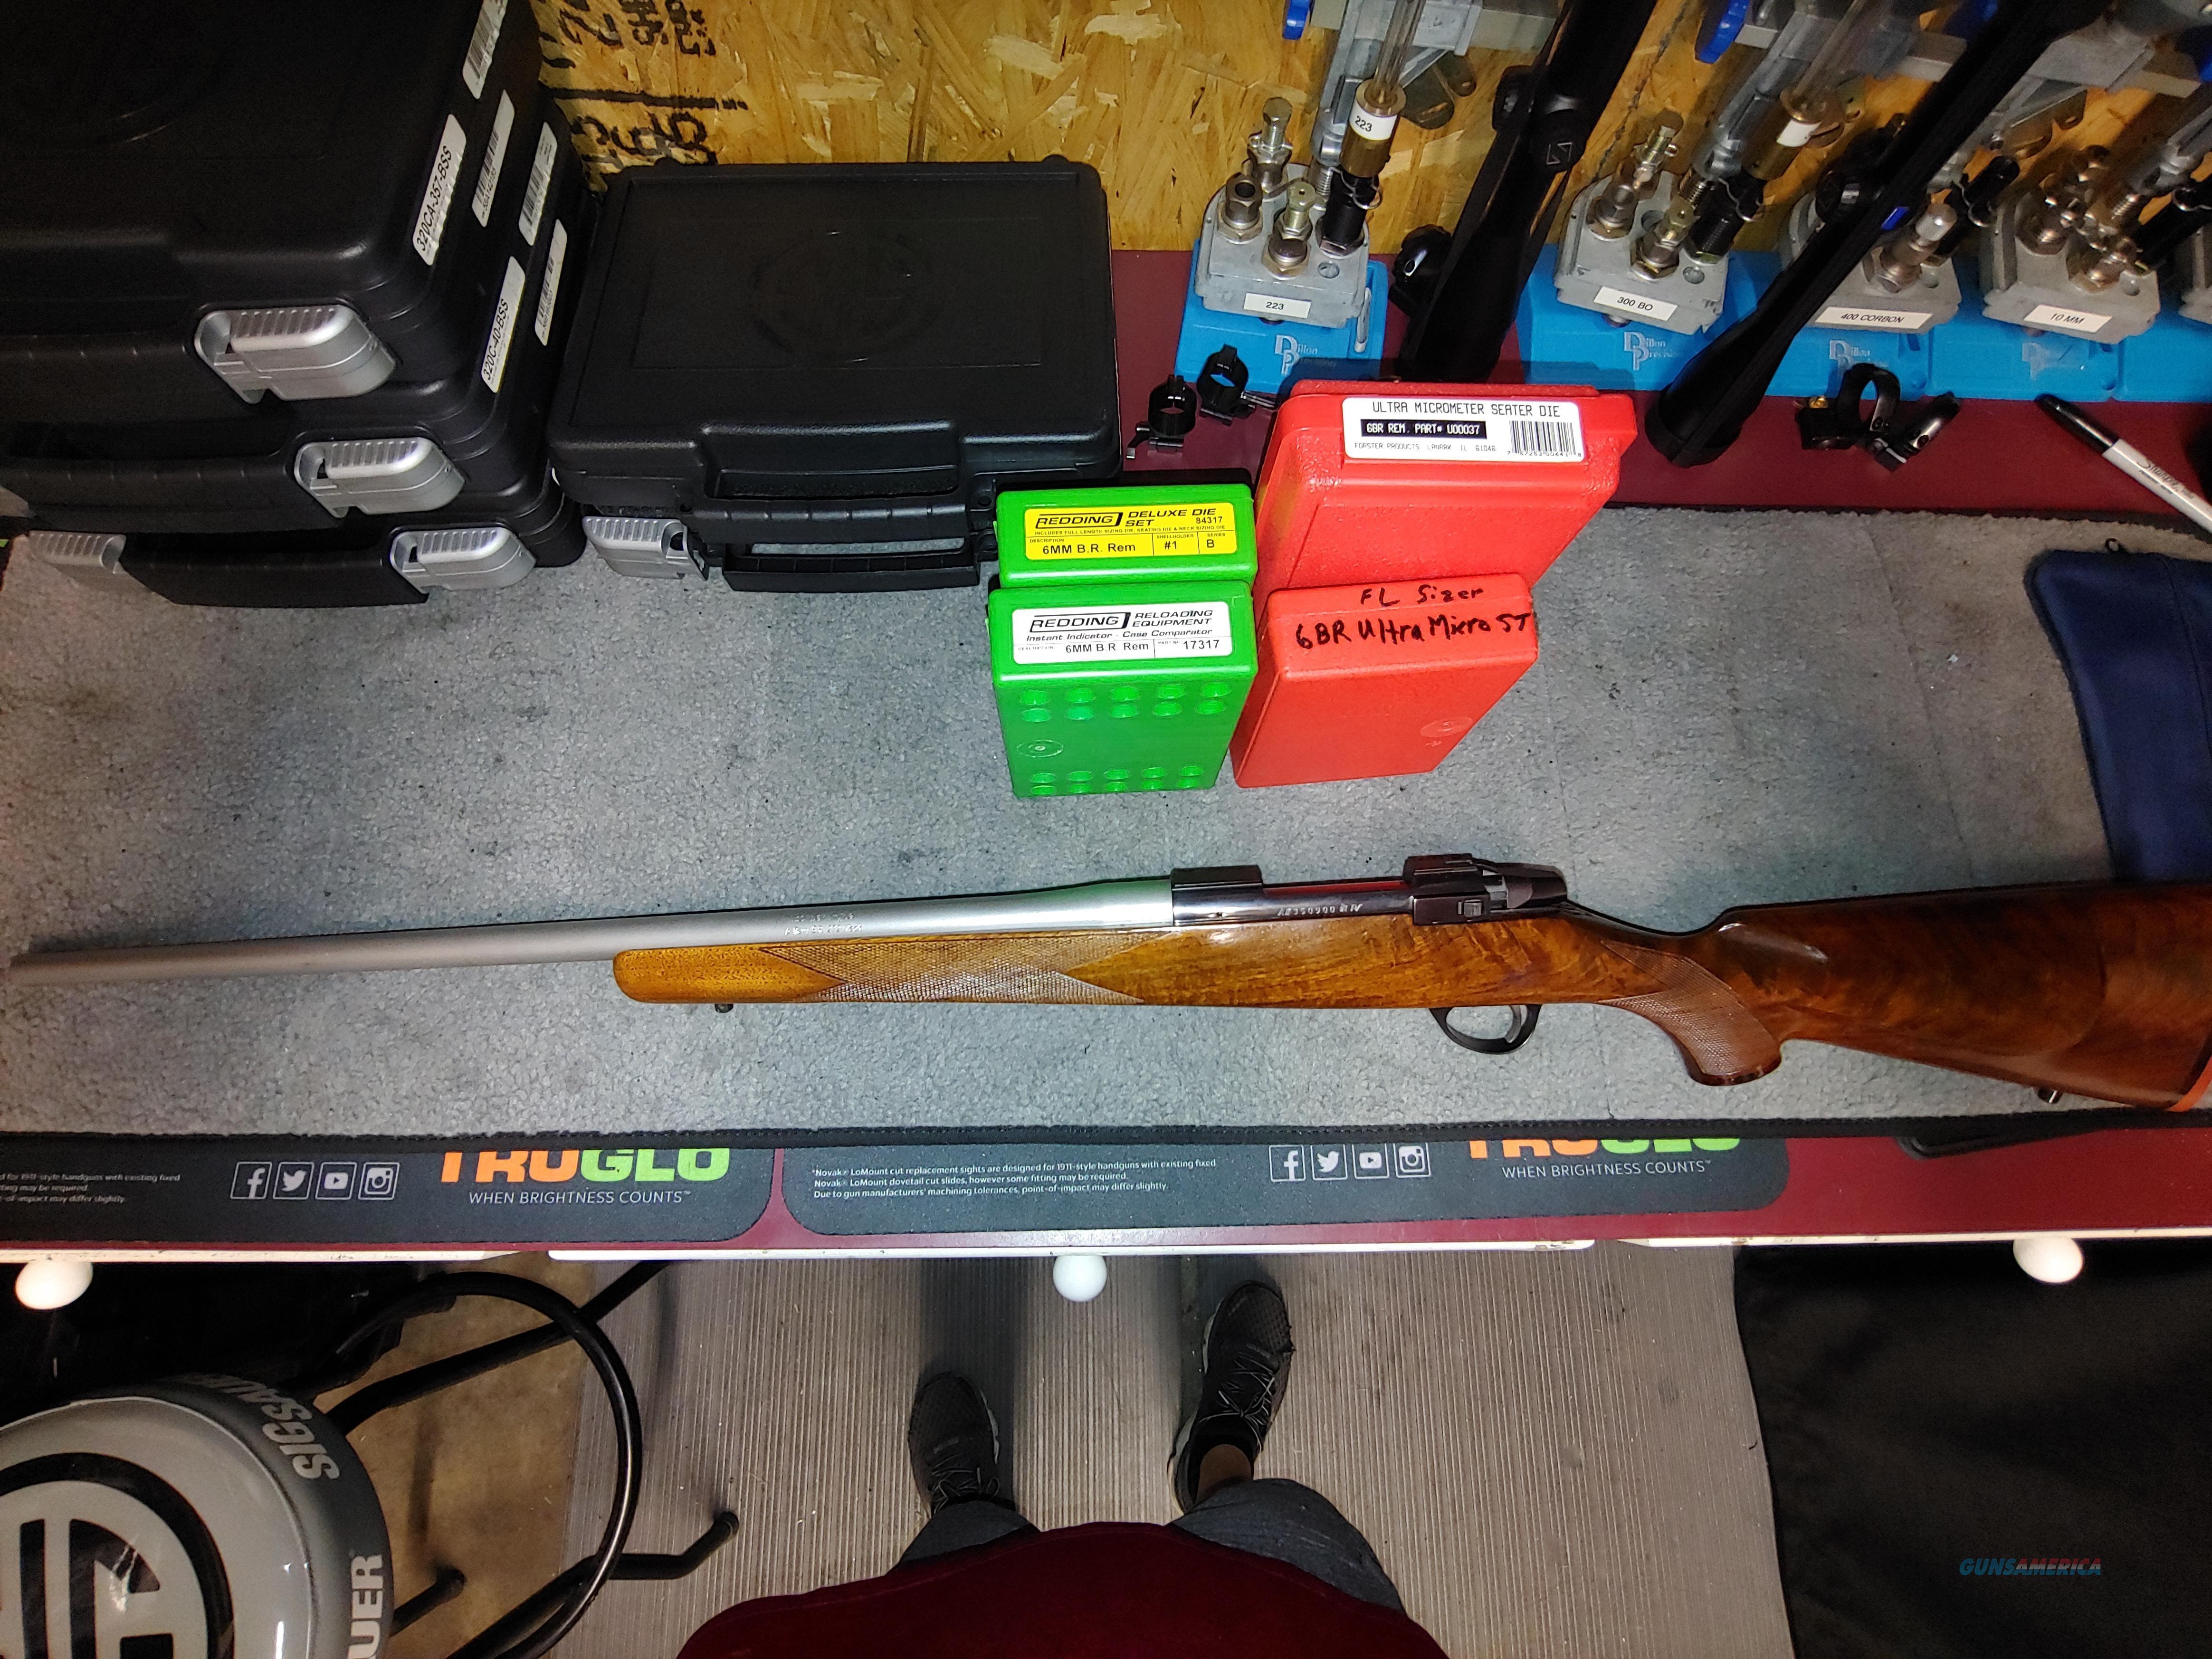 SAKO AII  Guns > Rifles > Sako Rifles > Other Bolt Action